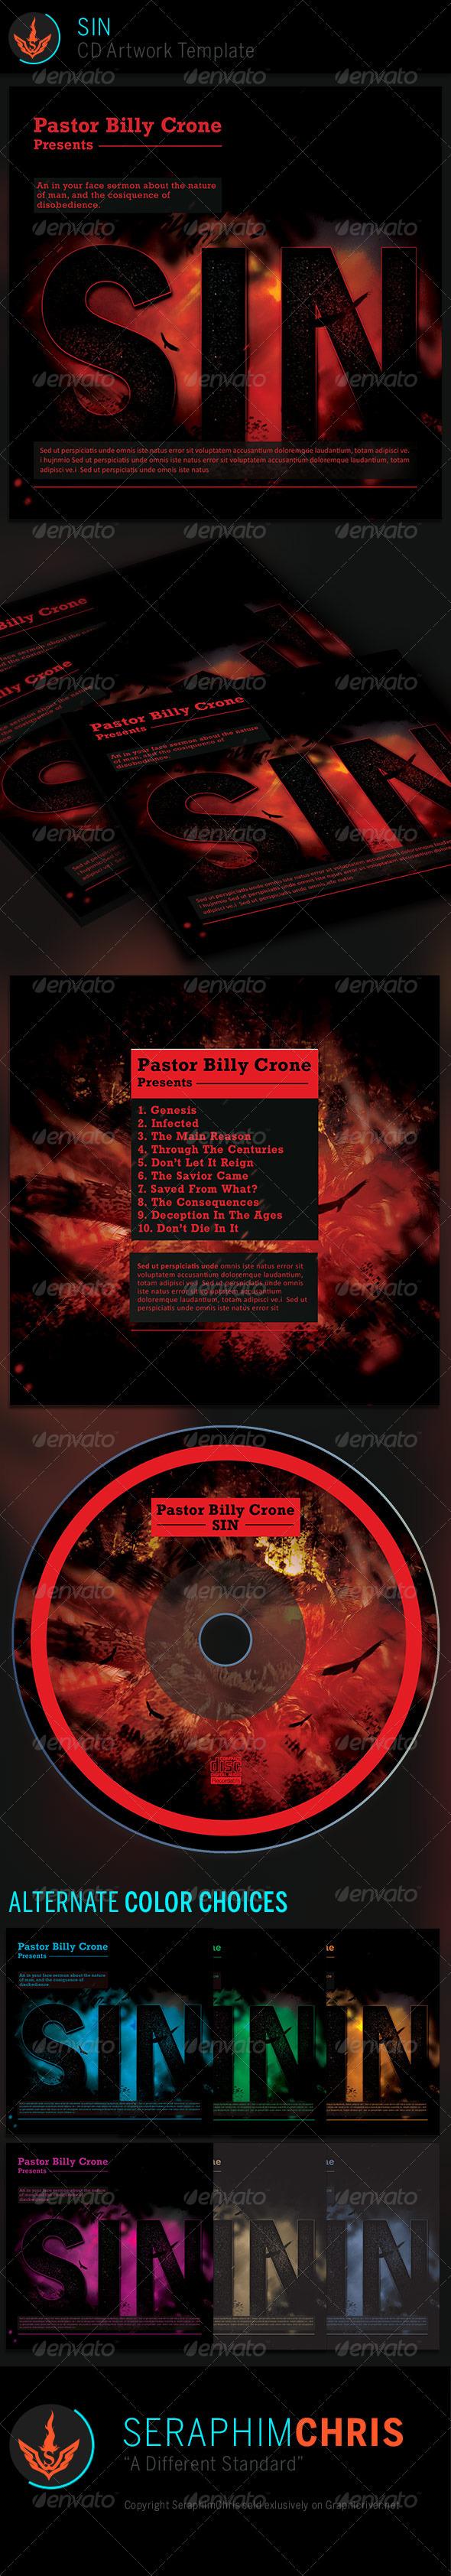 GraphicRiver SIN CD Artwork Template 7084524